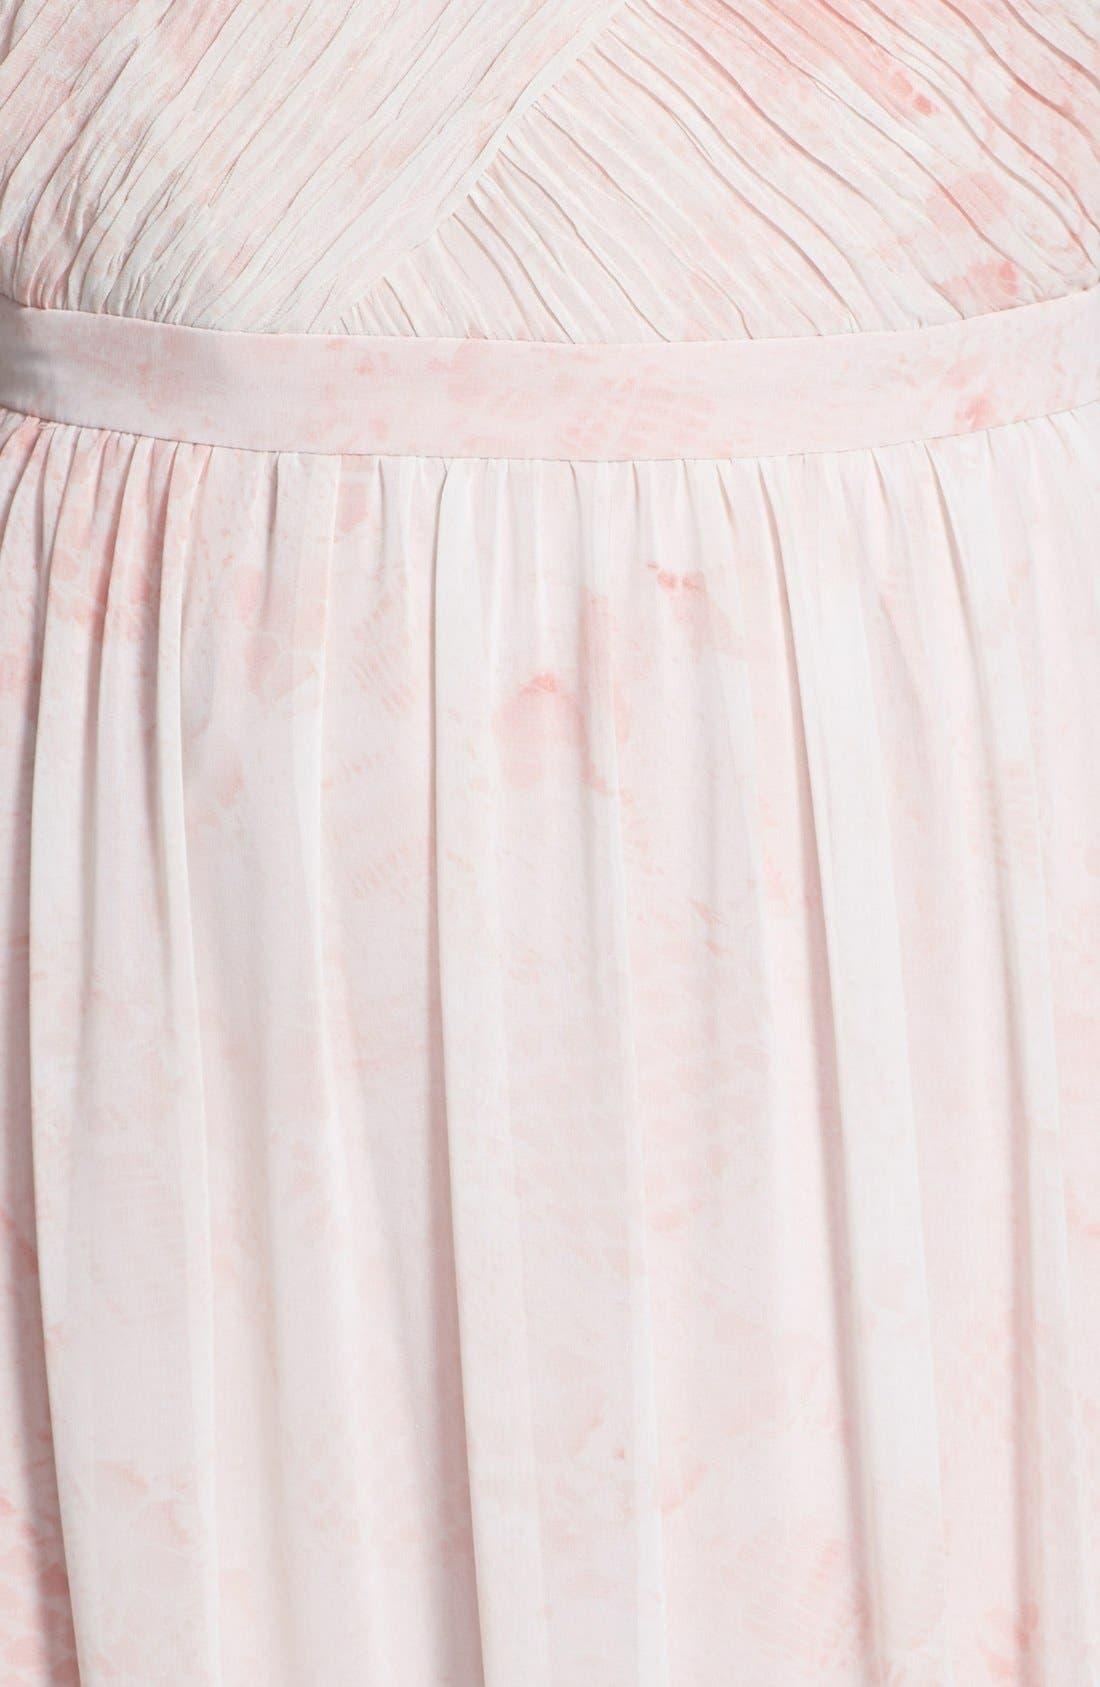 Alternate Image 3  - ERIN erin fetherston 'Rose' Print Chiffon Strapless Gown